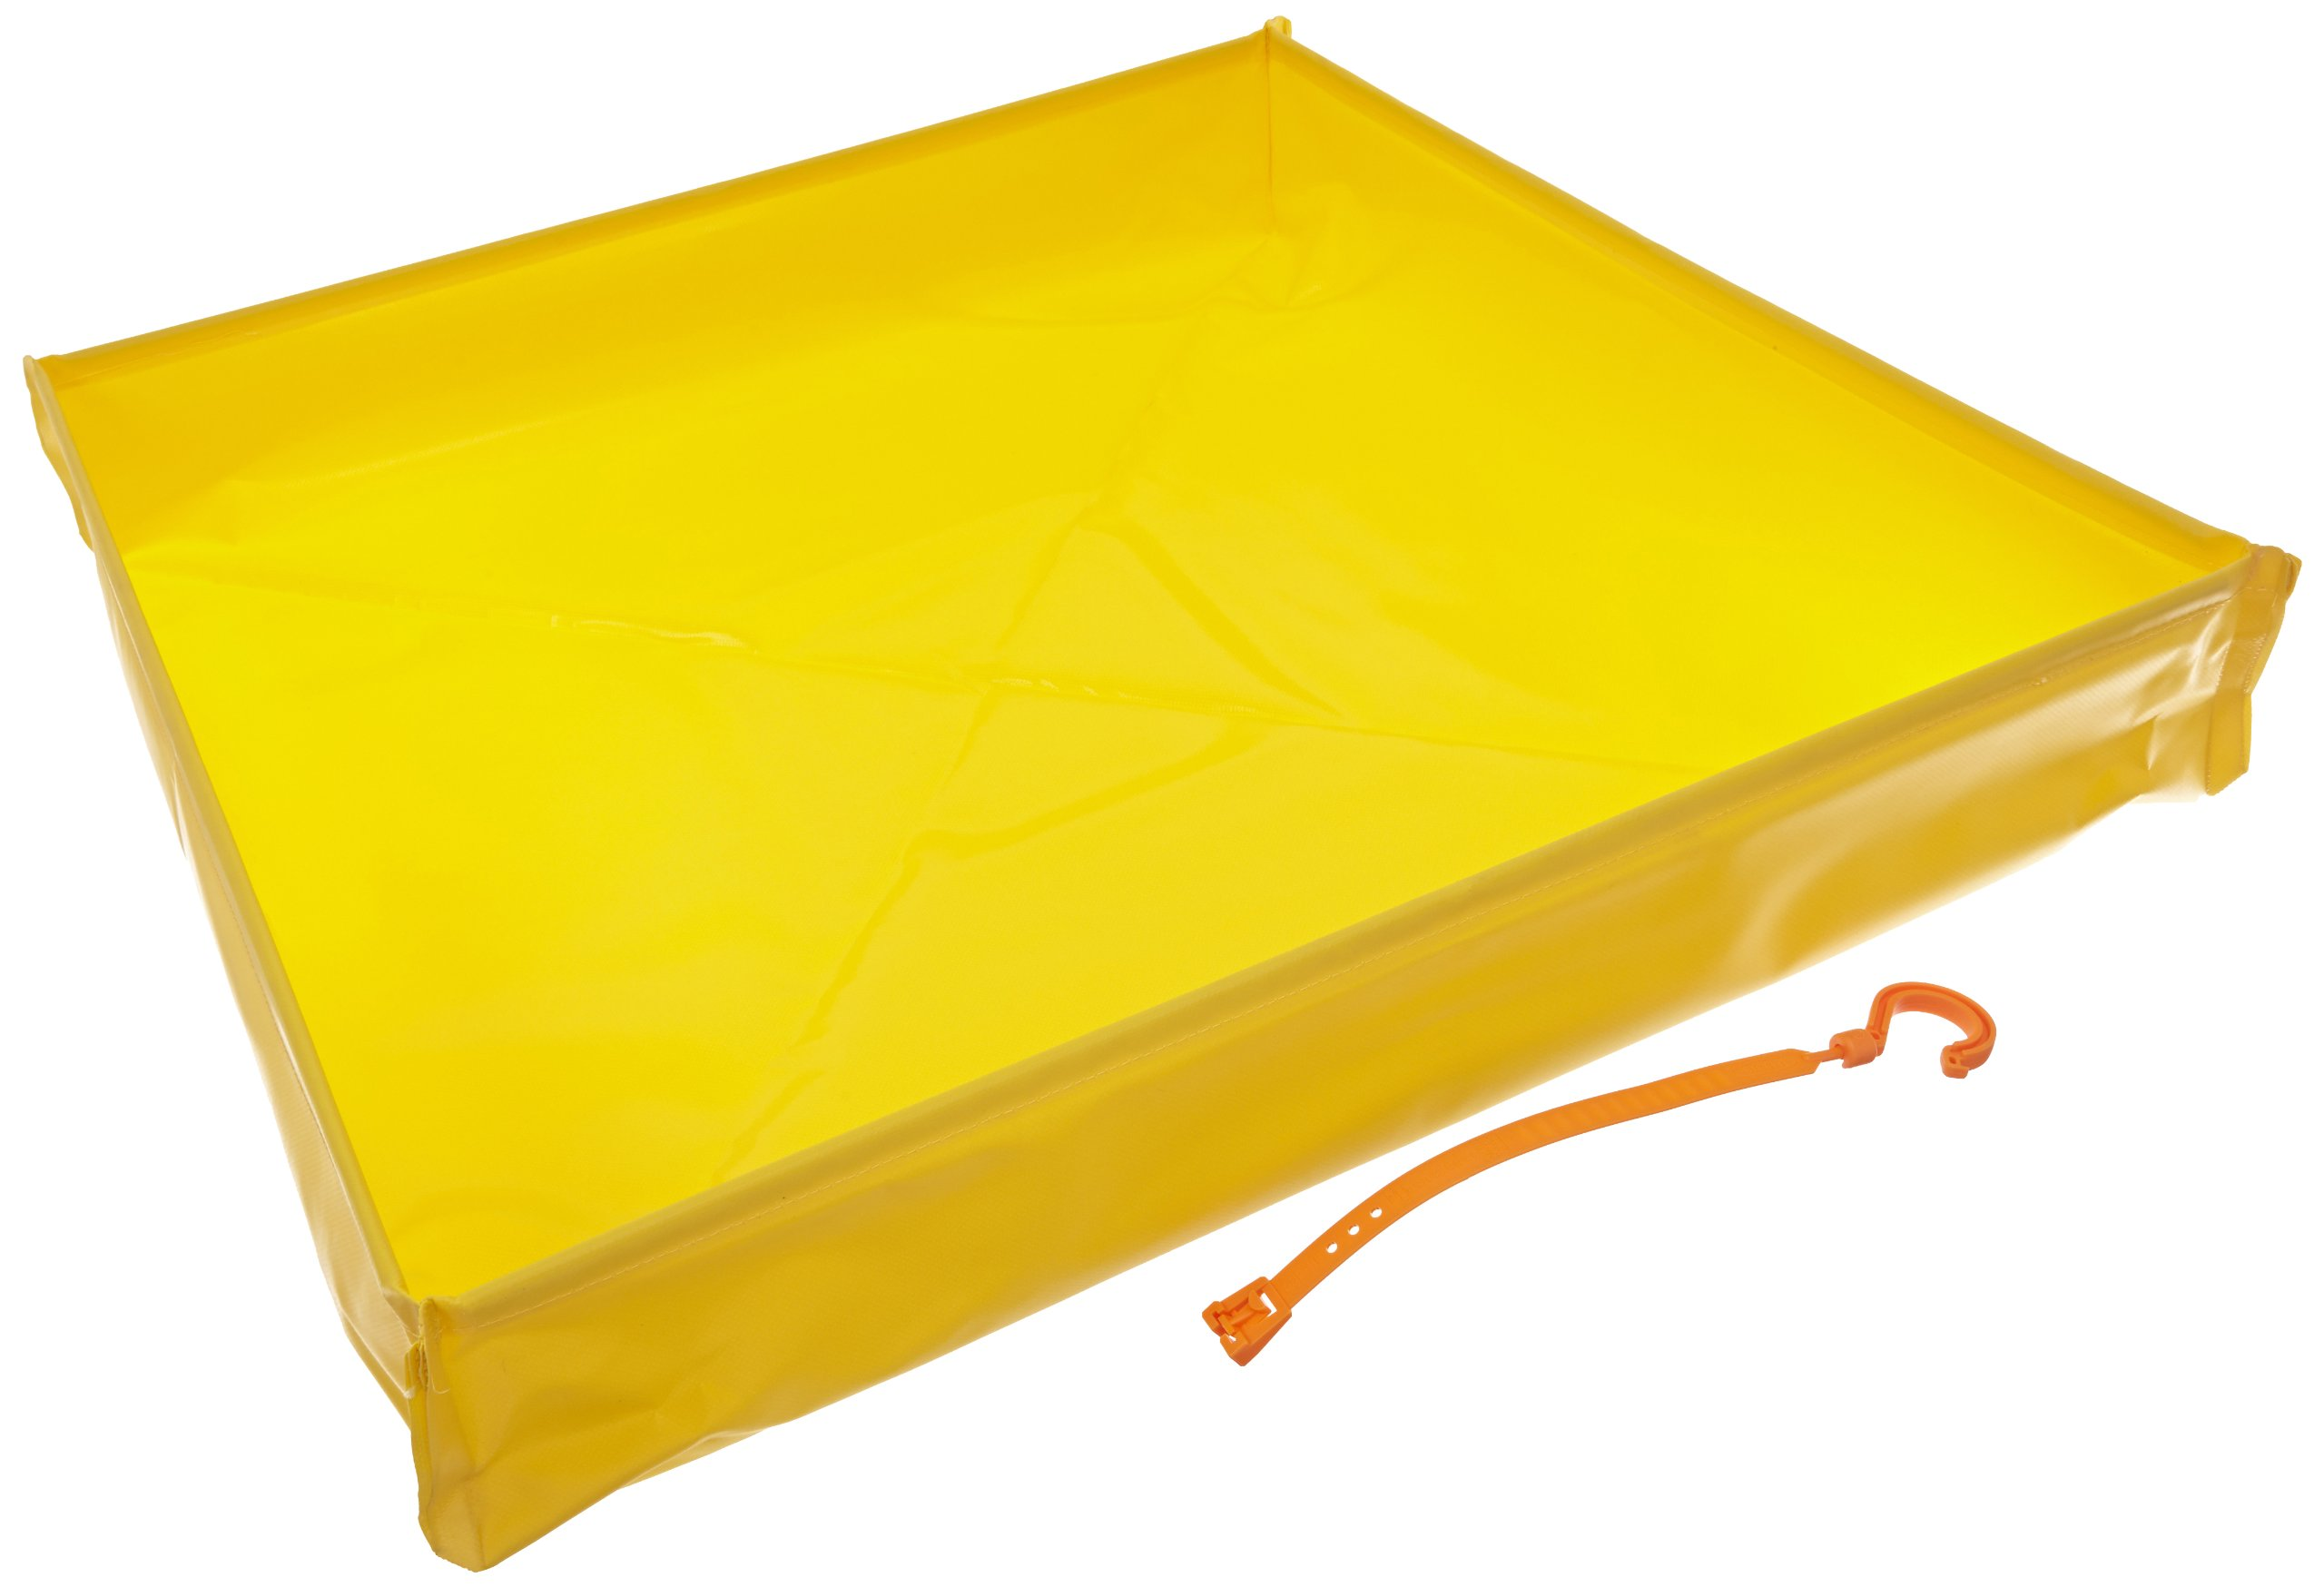 UltraTech 1332 PVC Fabric Flexible Ultra-Utility Tray, 30'' Length x 30'' Width x 4-3/4'' Height, Yellow